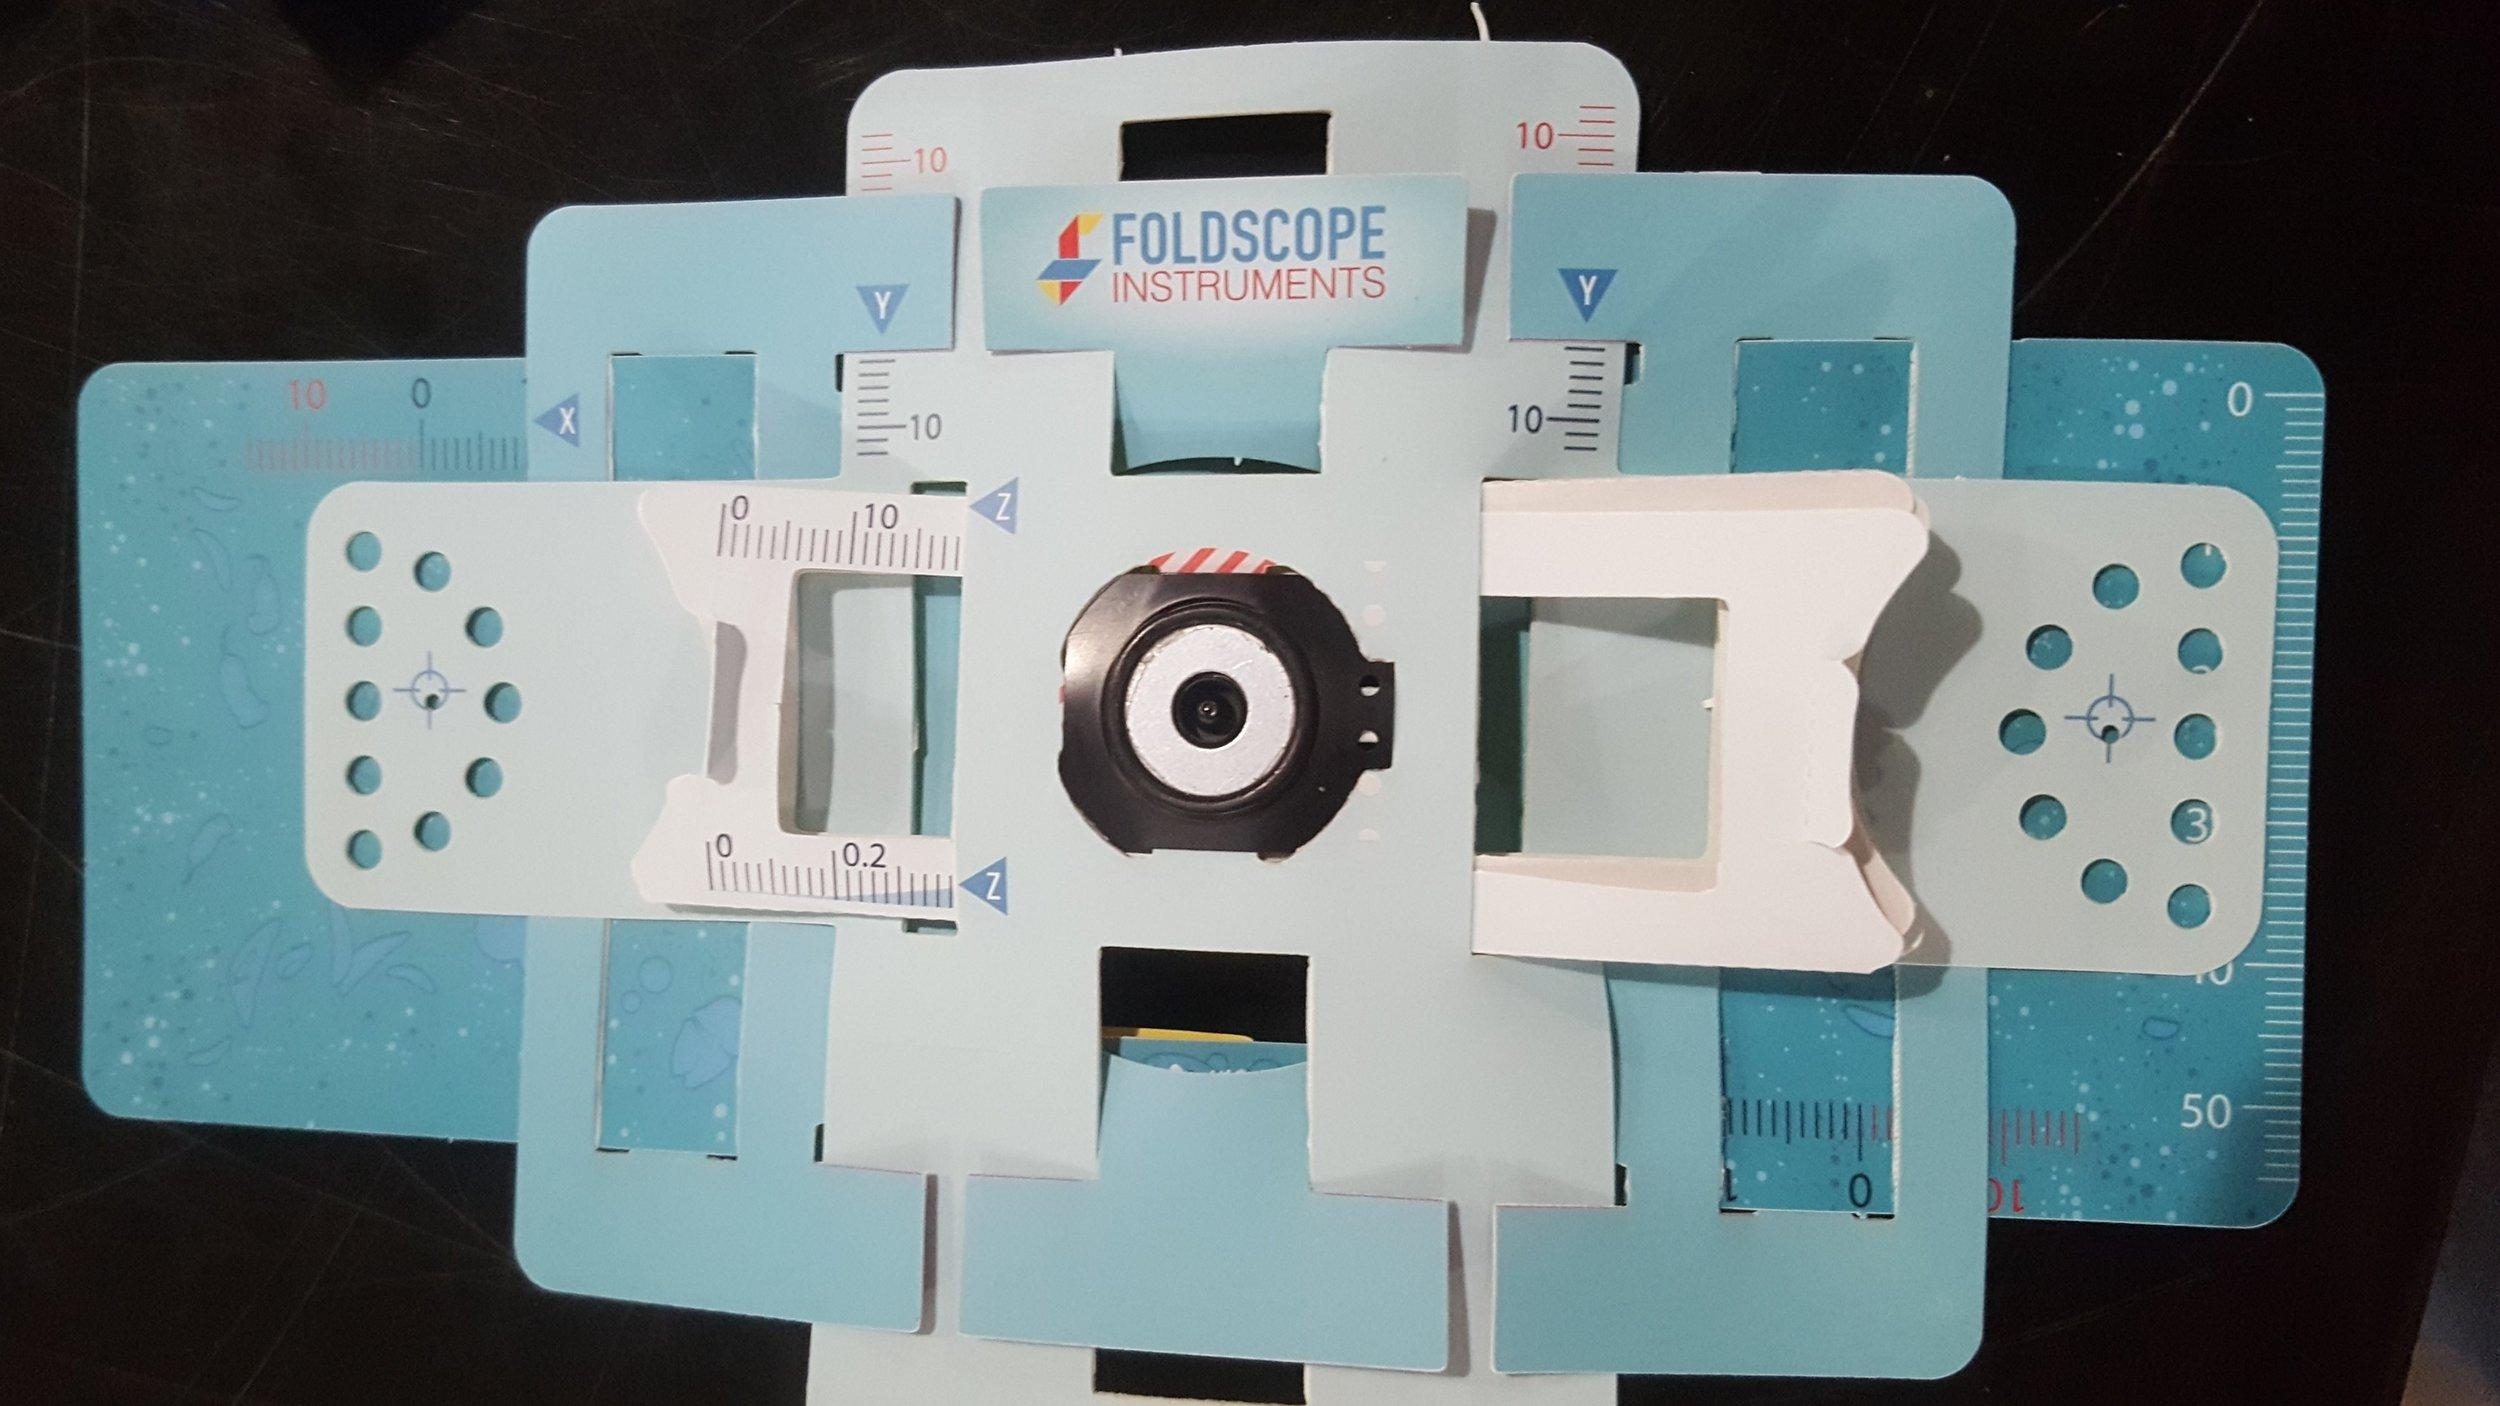 A completed Foldscope Microscope.